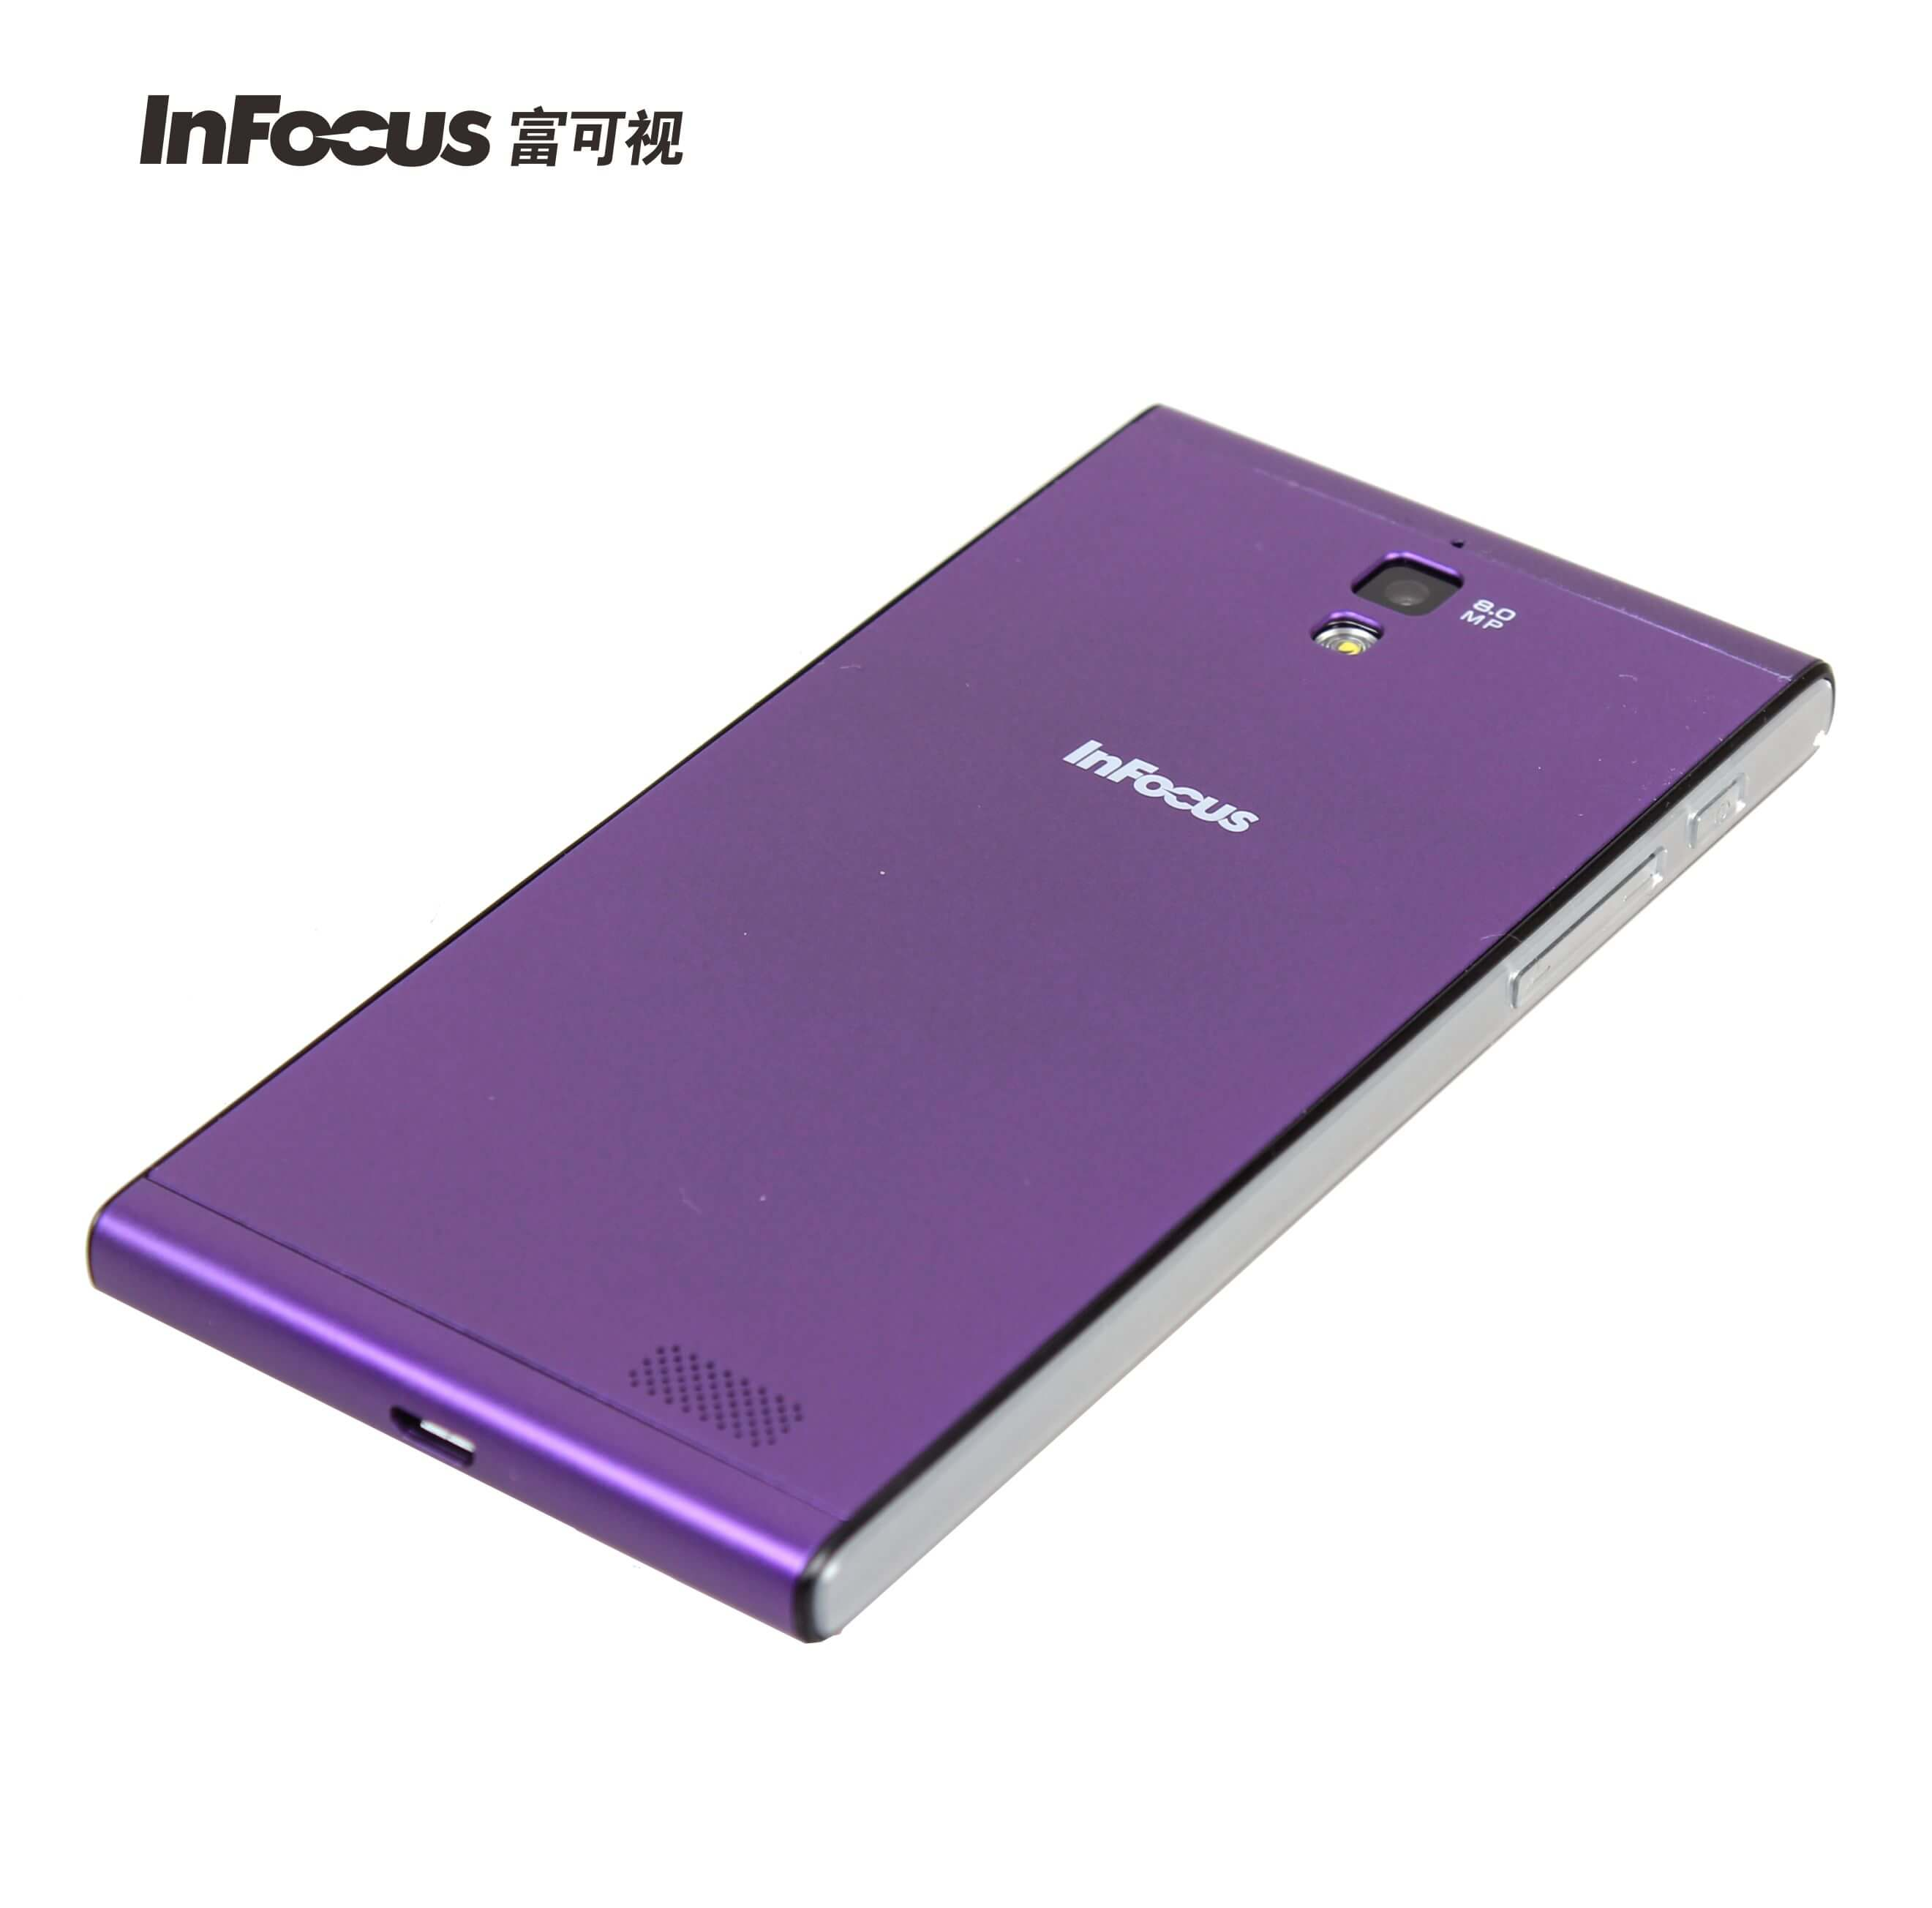 InFocus M310 Charm Purple back